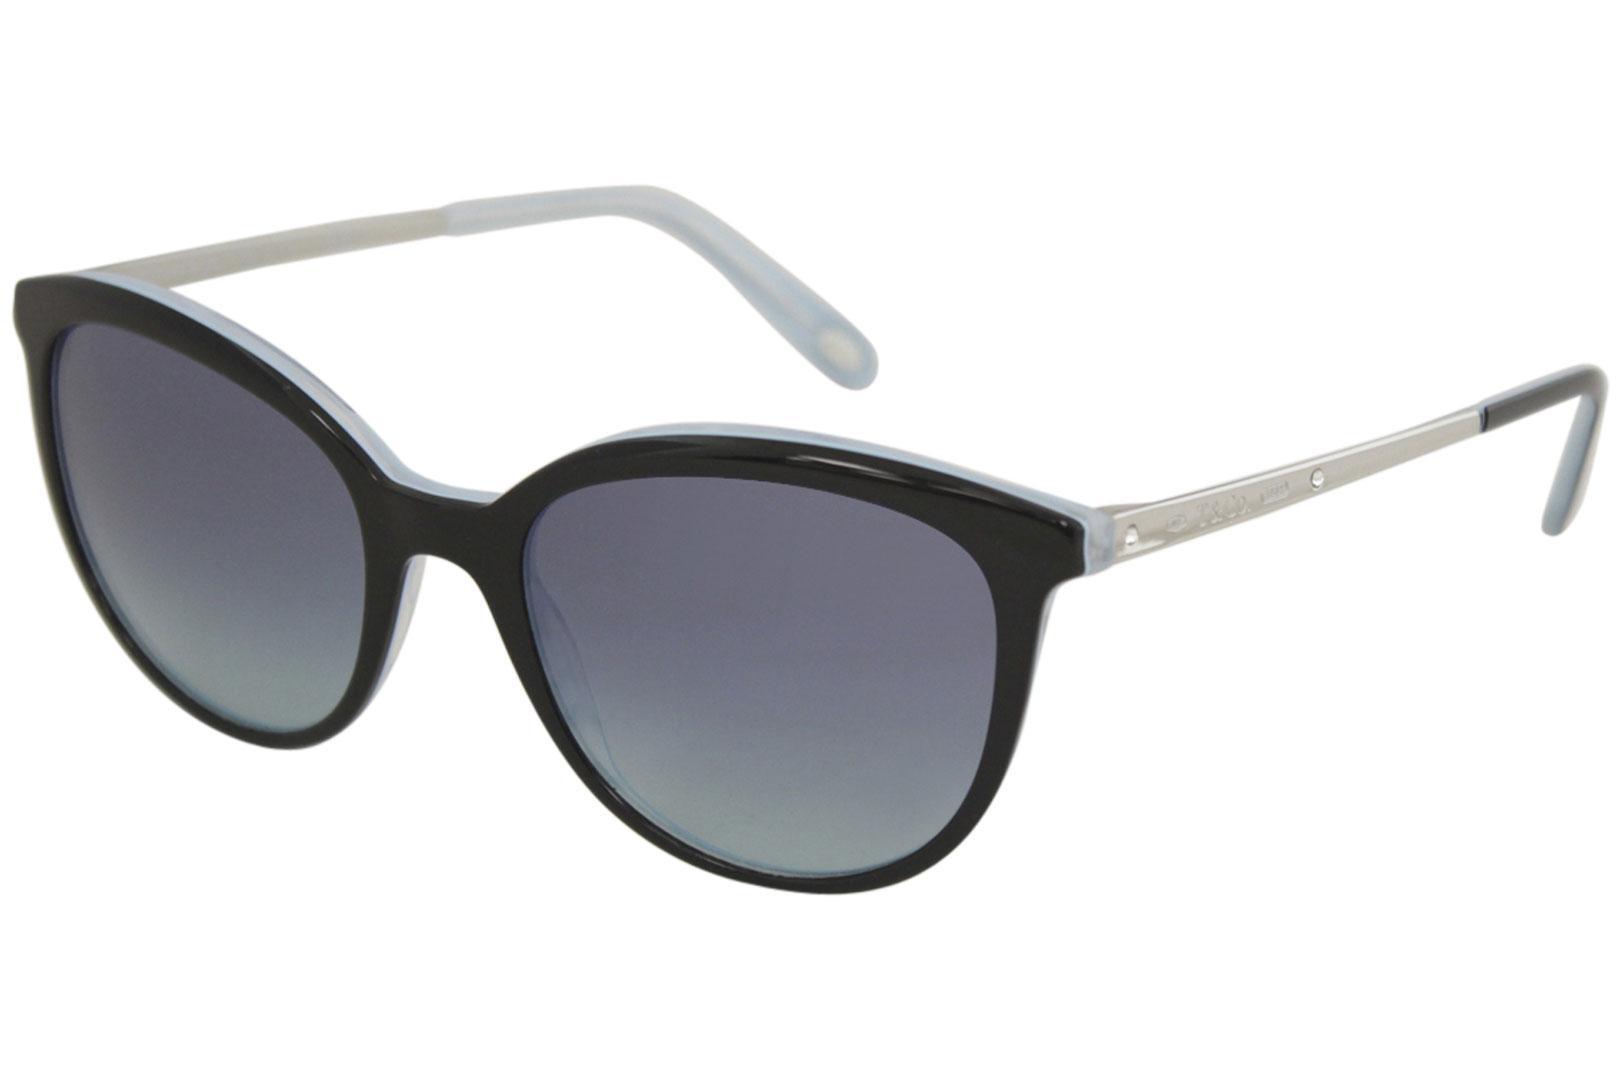 84d4cca4ef6db Women s TF4117B TF 4117 B Fashion Square Sunglasses by Tiffany   Co. 12345